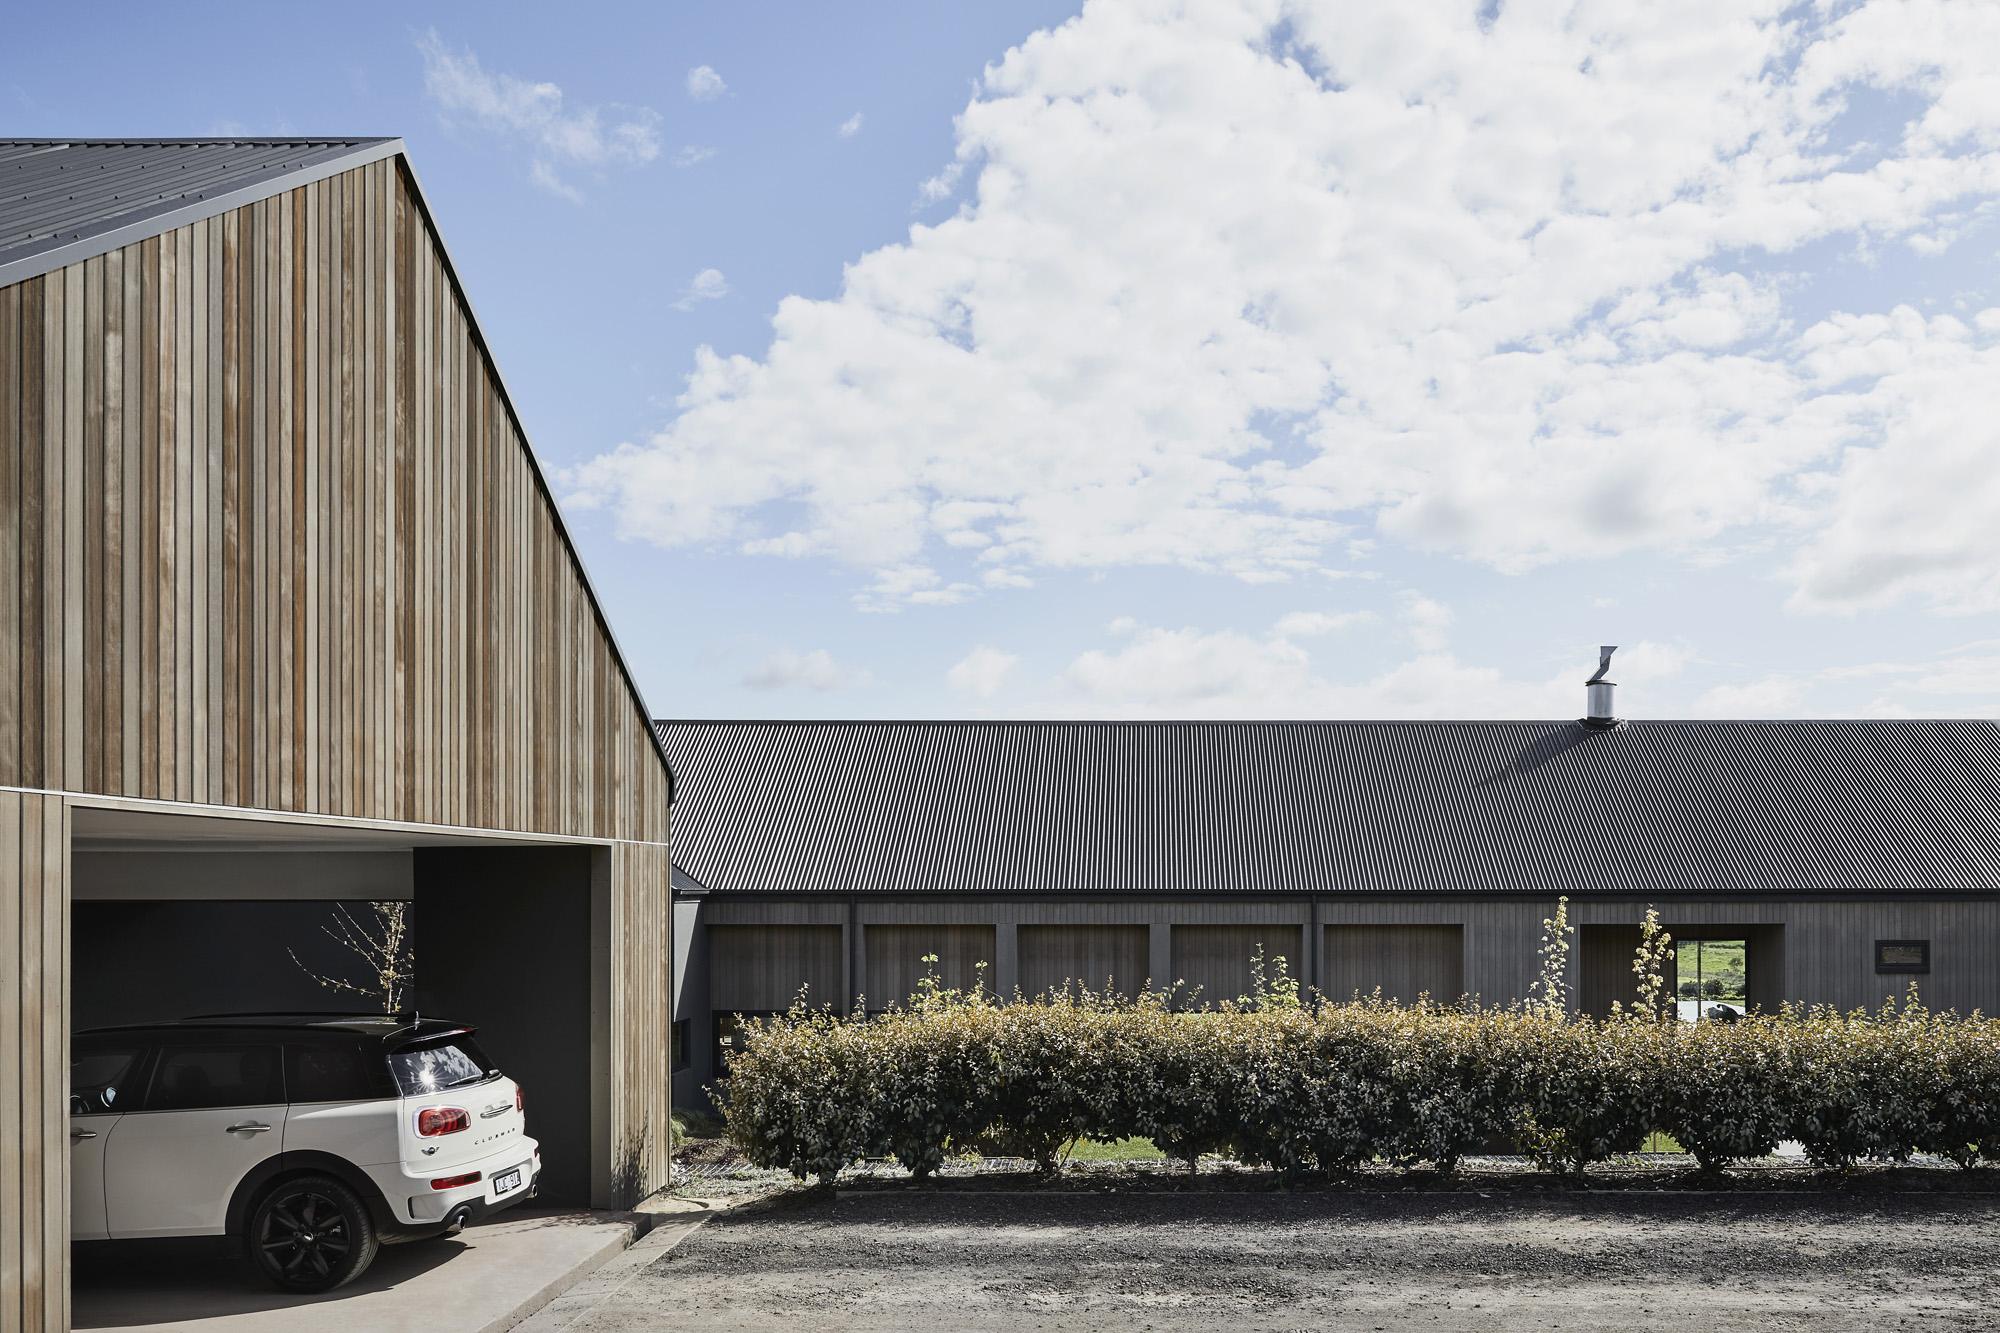 Dan Gayfer Design - MINI Australia - Feature Intervew - Australian Architecture - Ceres House, Victoria - Image 9